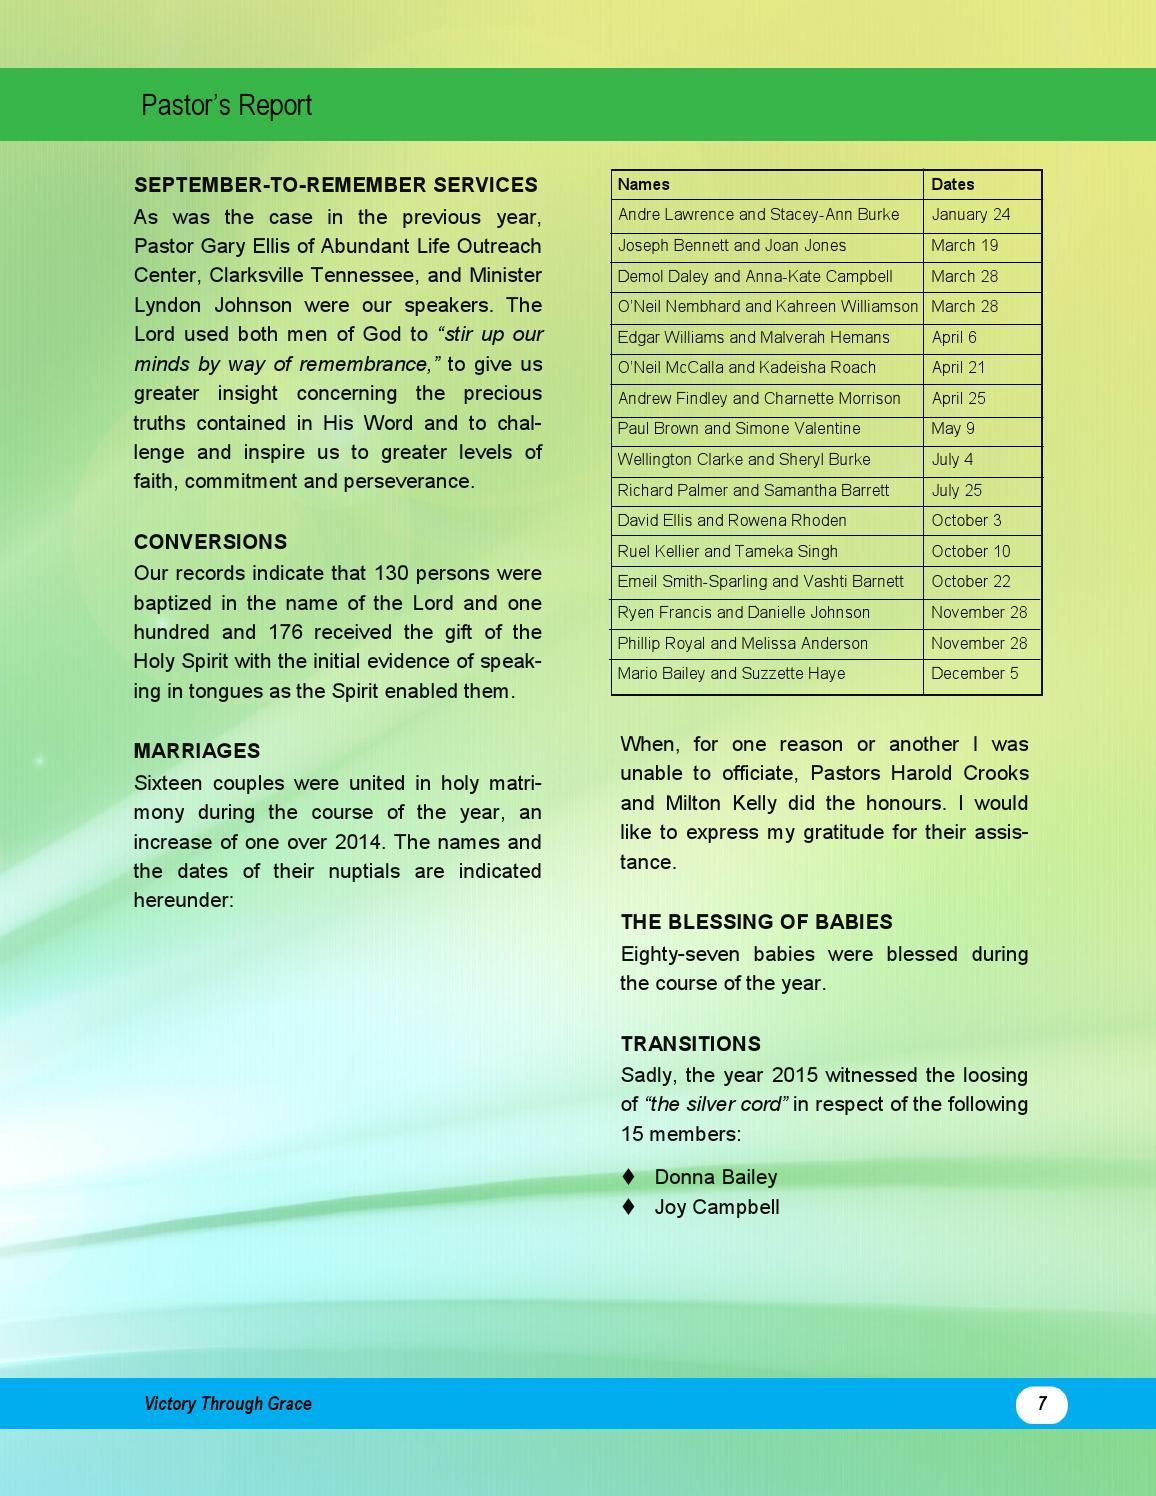 Pentecostal Tabernacle Annual Report 2015 by Pentecostal